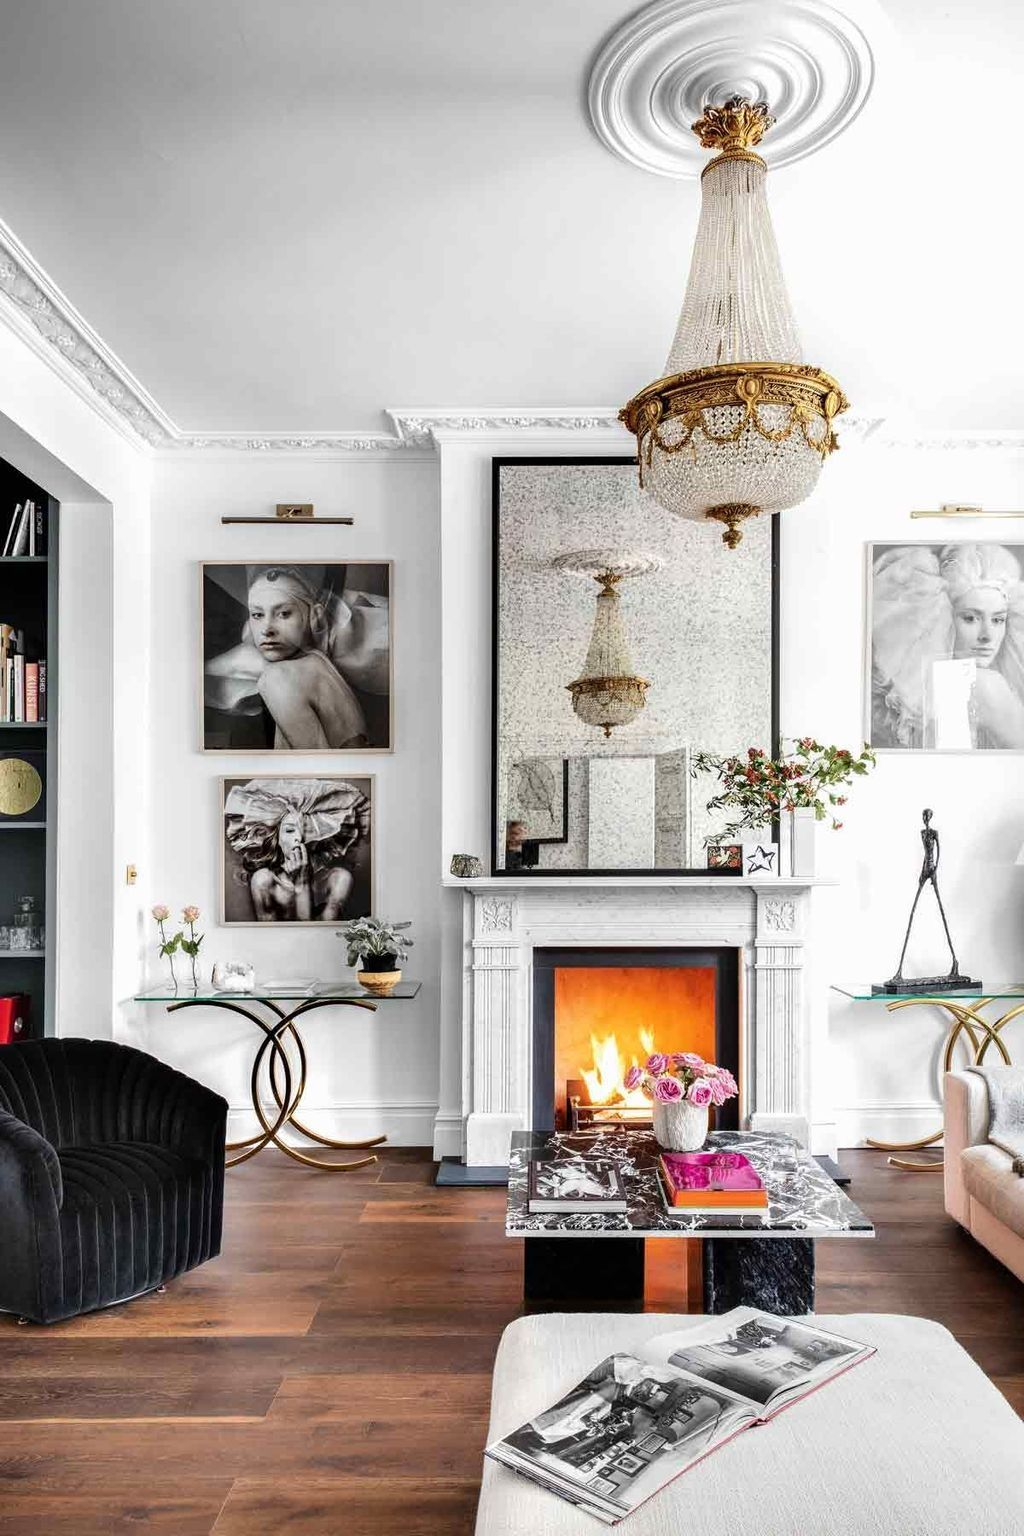 40 Spectacular Contemporary Living Room Interior Designs Ideas To Try Contemporary Living Room Elegant Living Room Decor Stylish Bedroom Design